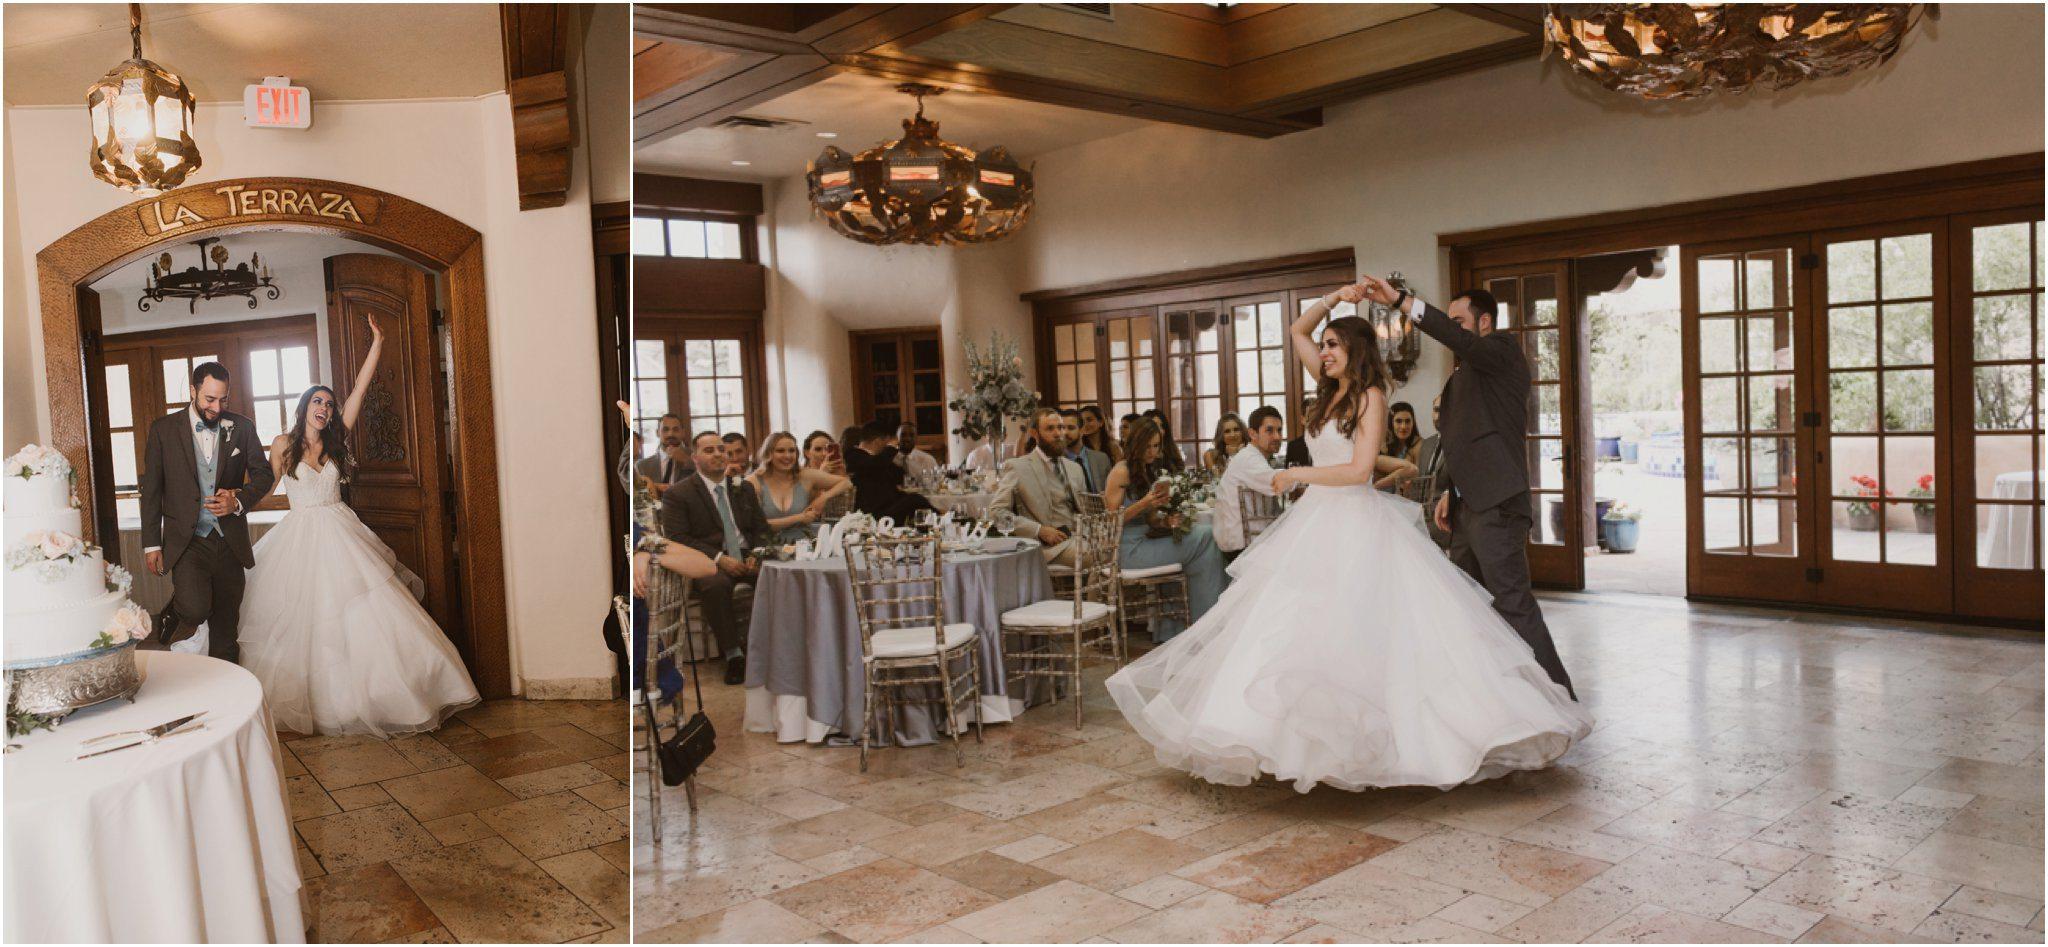 35Blue Rose Photography_ Albuquerque_ Santa Fe_ New Mexico wedding photographers